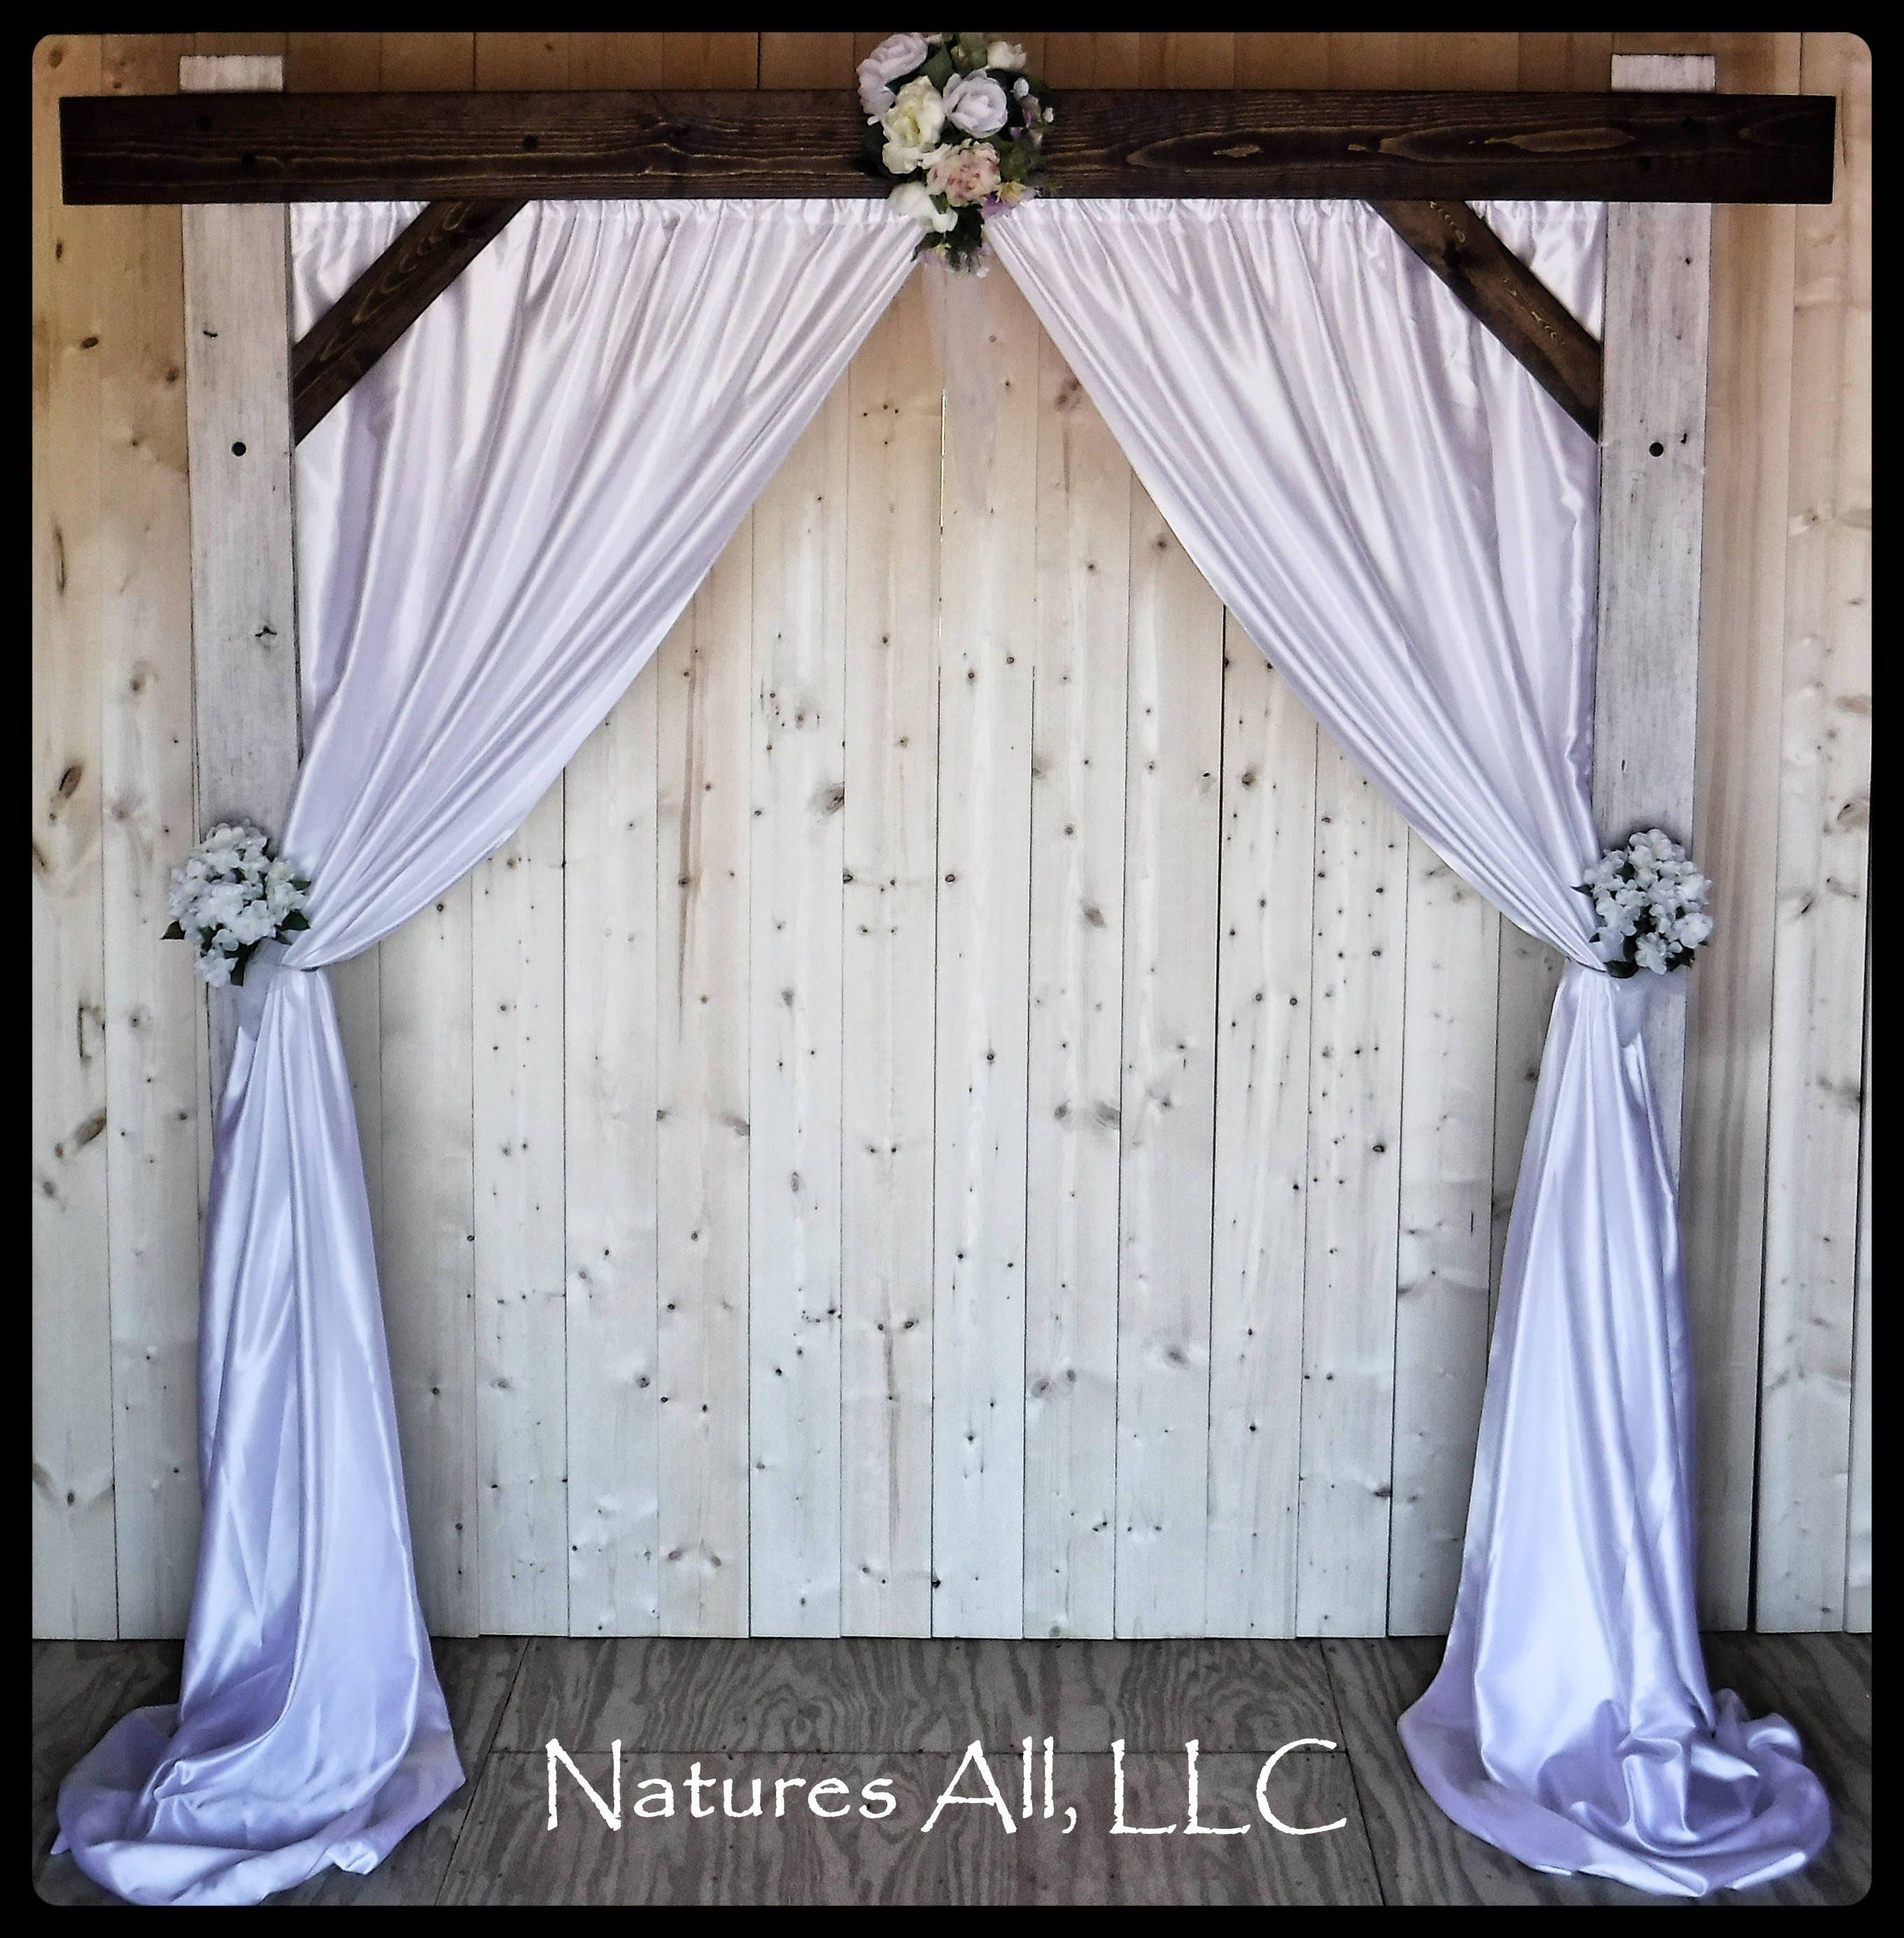 Wedding Arch Decorations Fabric: Wedding Arch And Fabric Backdrop/Wedding Arbor For